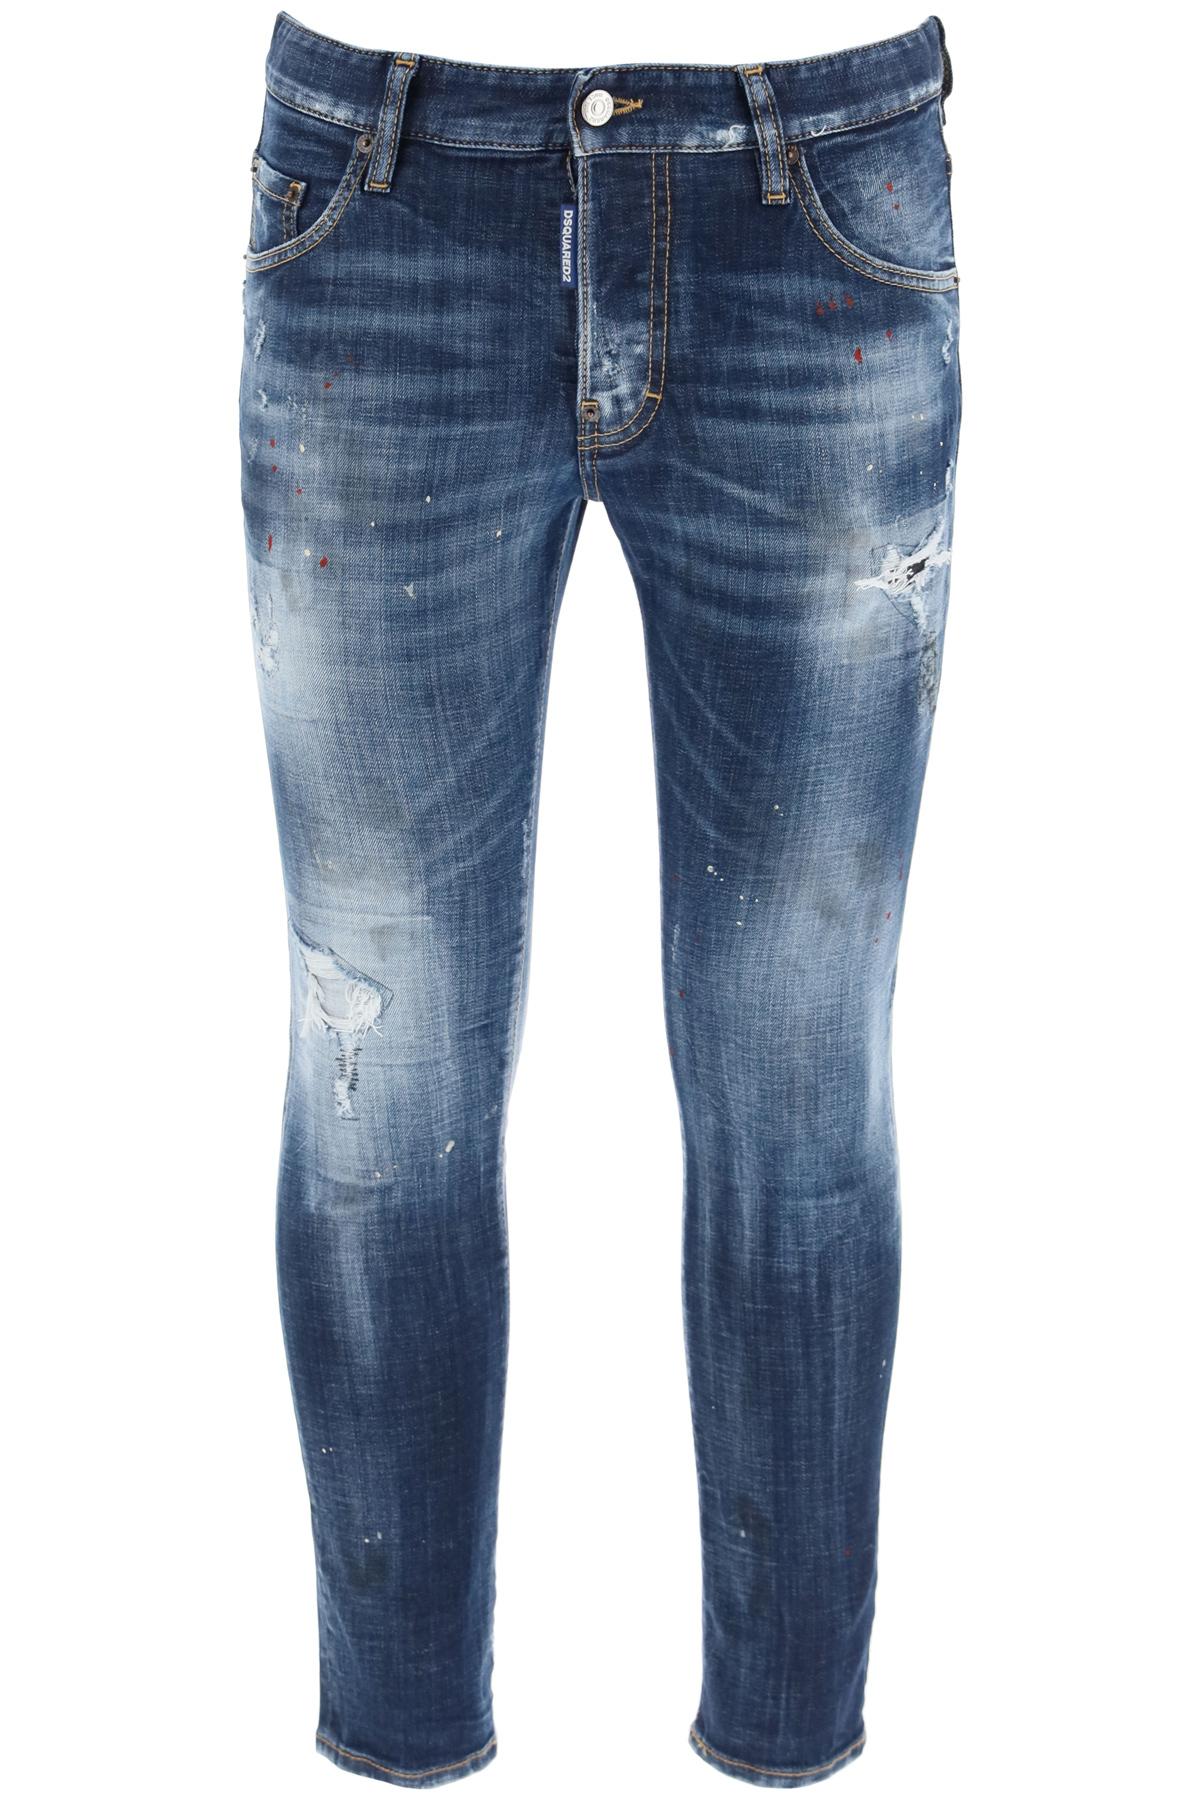 Dsquared2 jeans fit skater